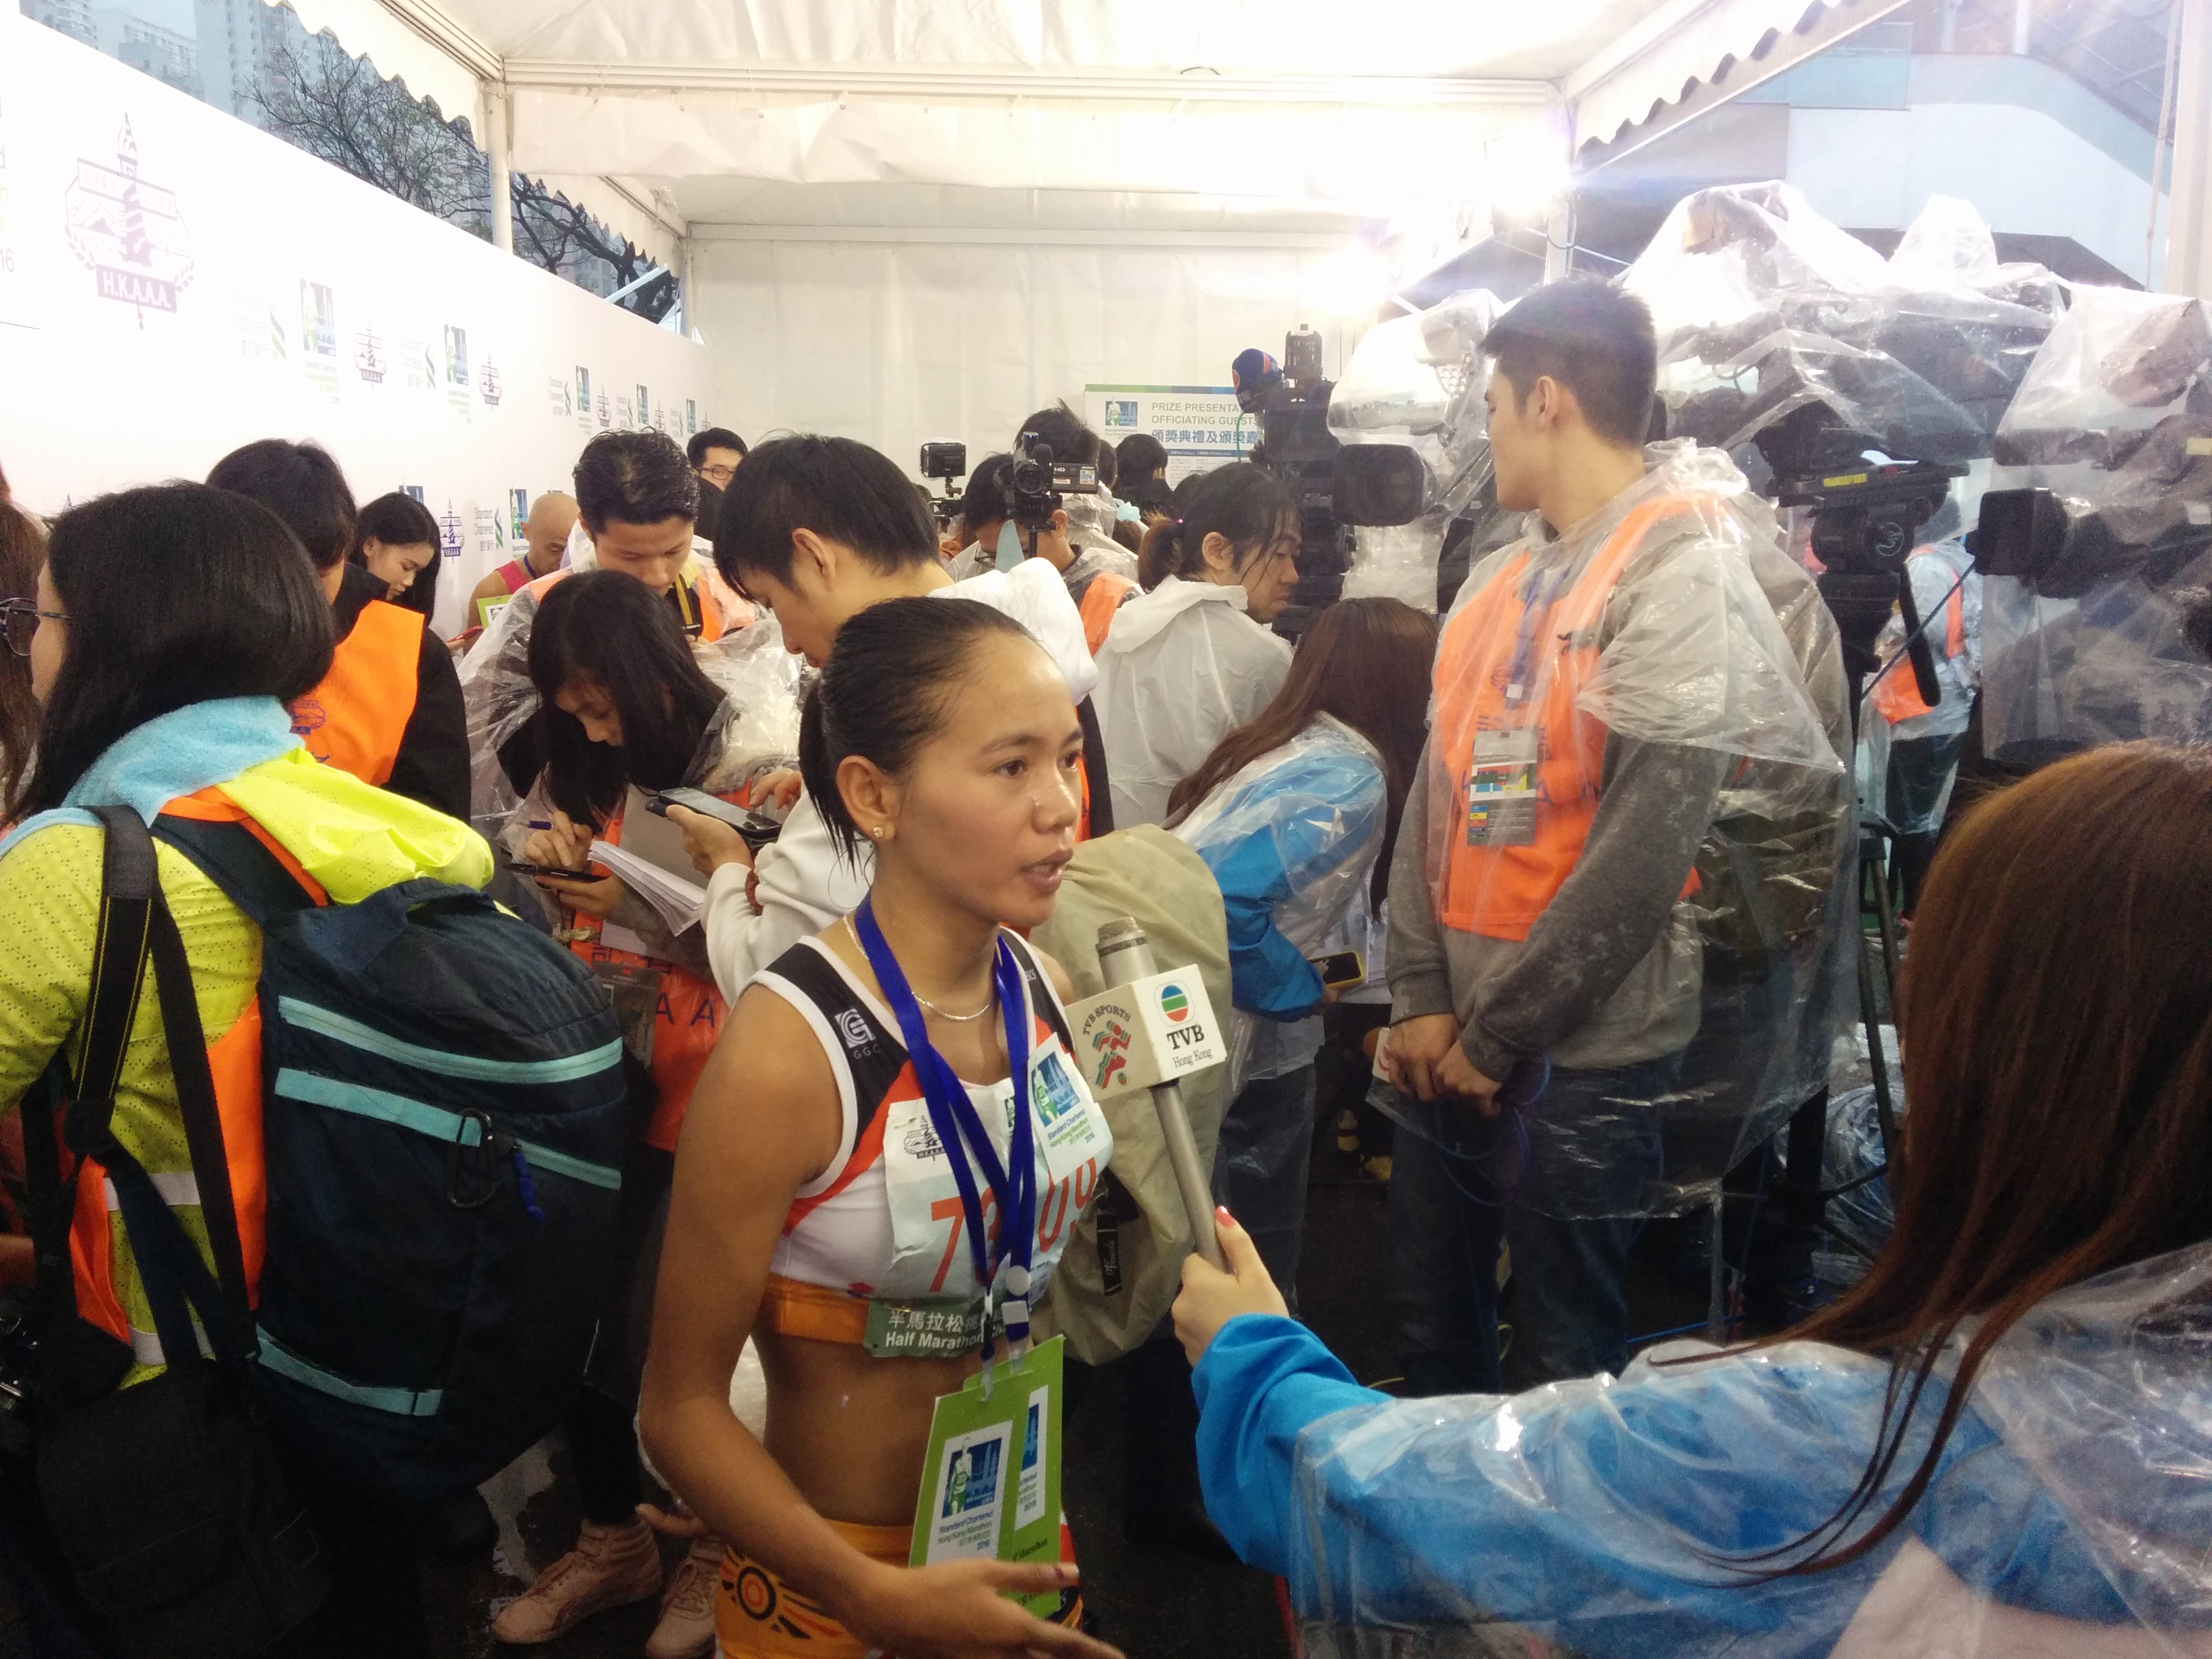 hong kong marathon 61 000 runners 10 hospitalised one